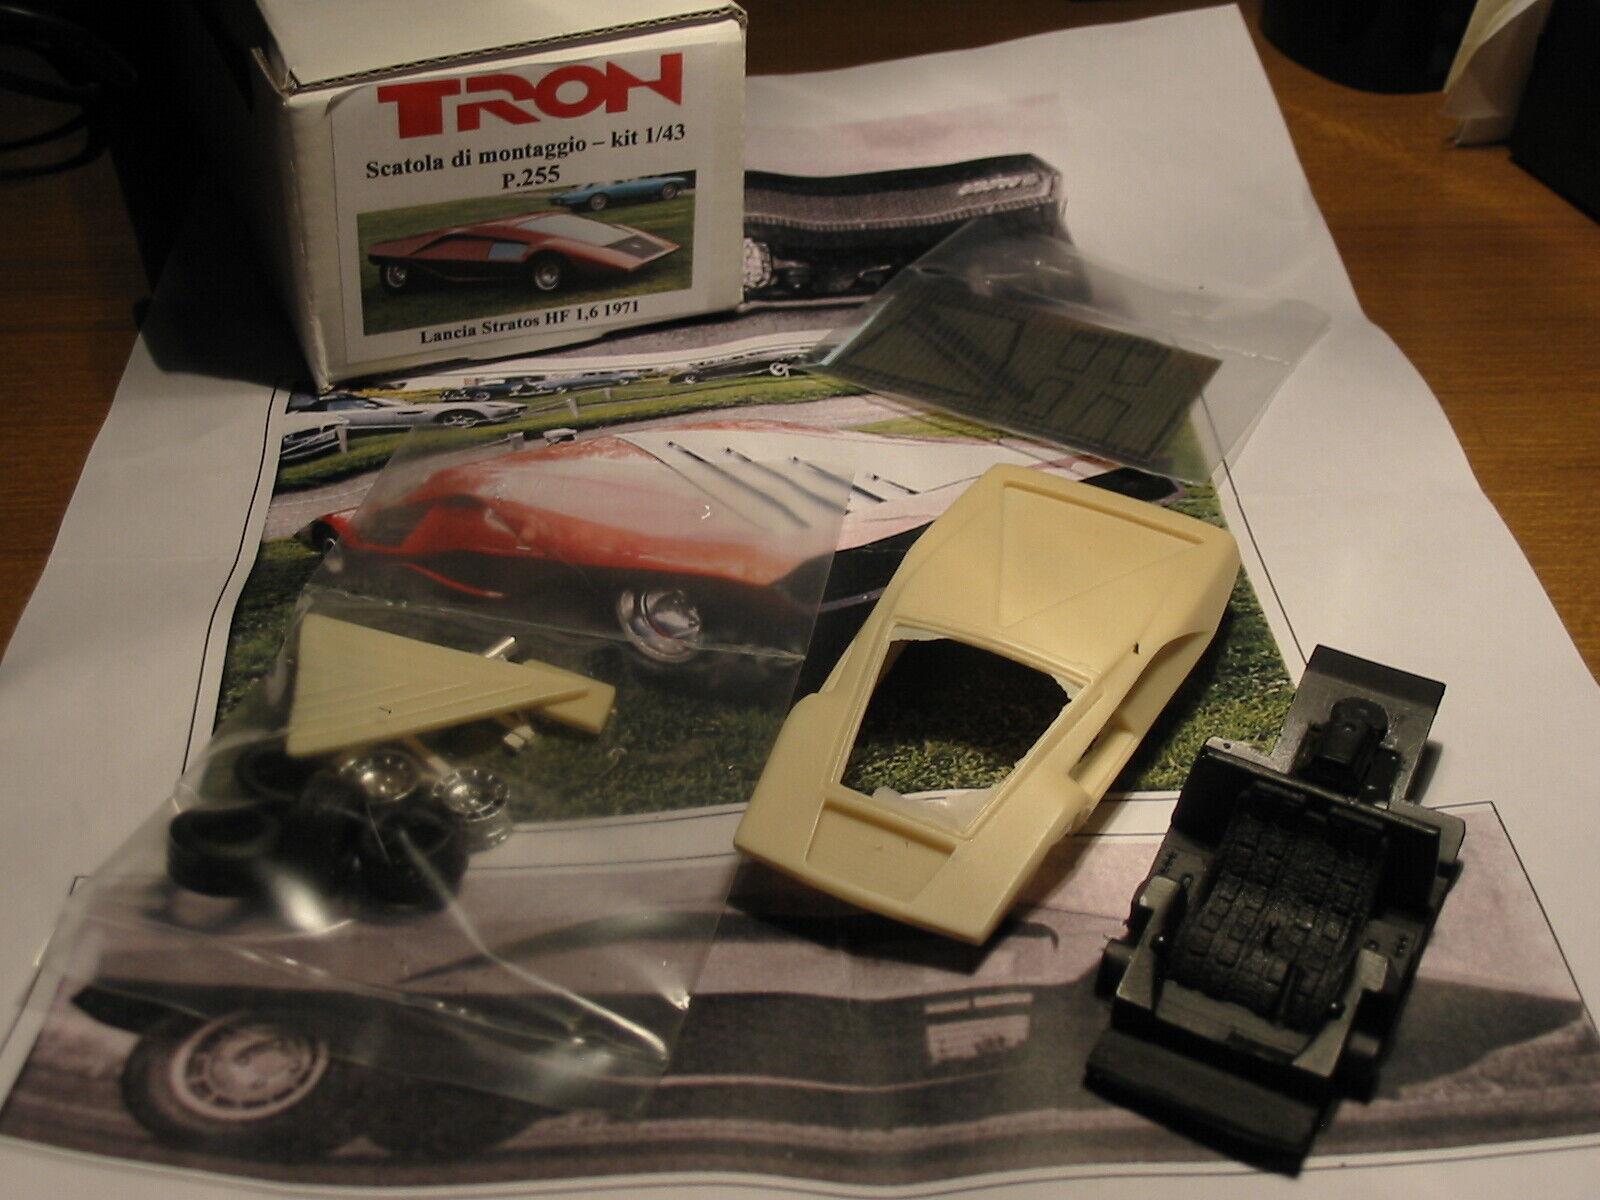 kit Lancia Stratos 1,6 projootype 1971 - Tron Models kit 1 43